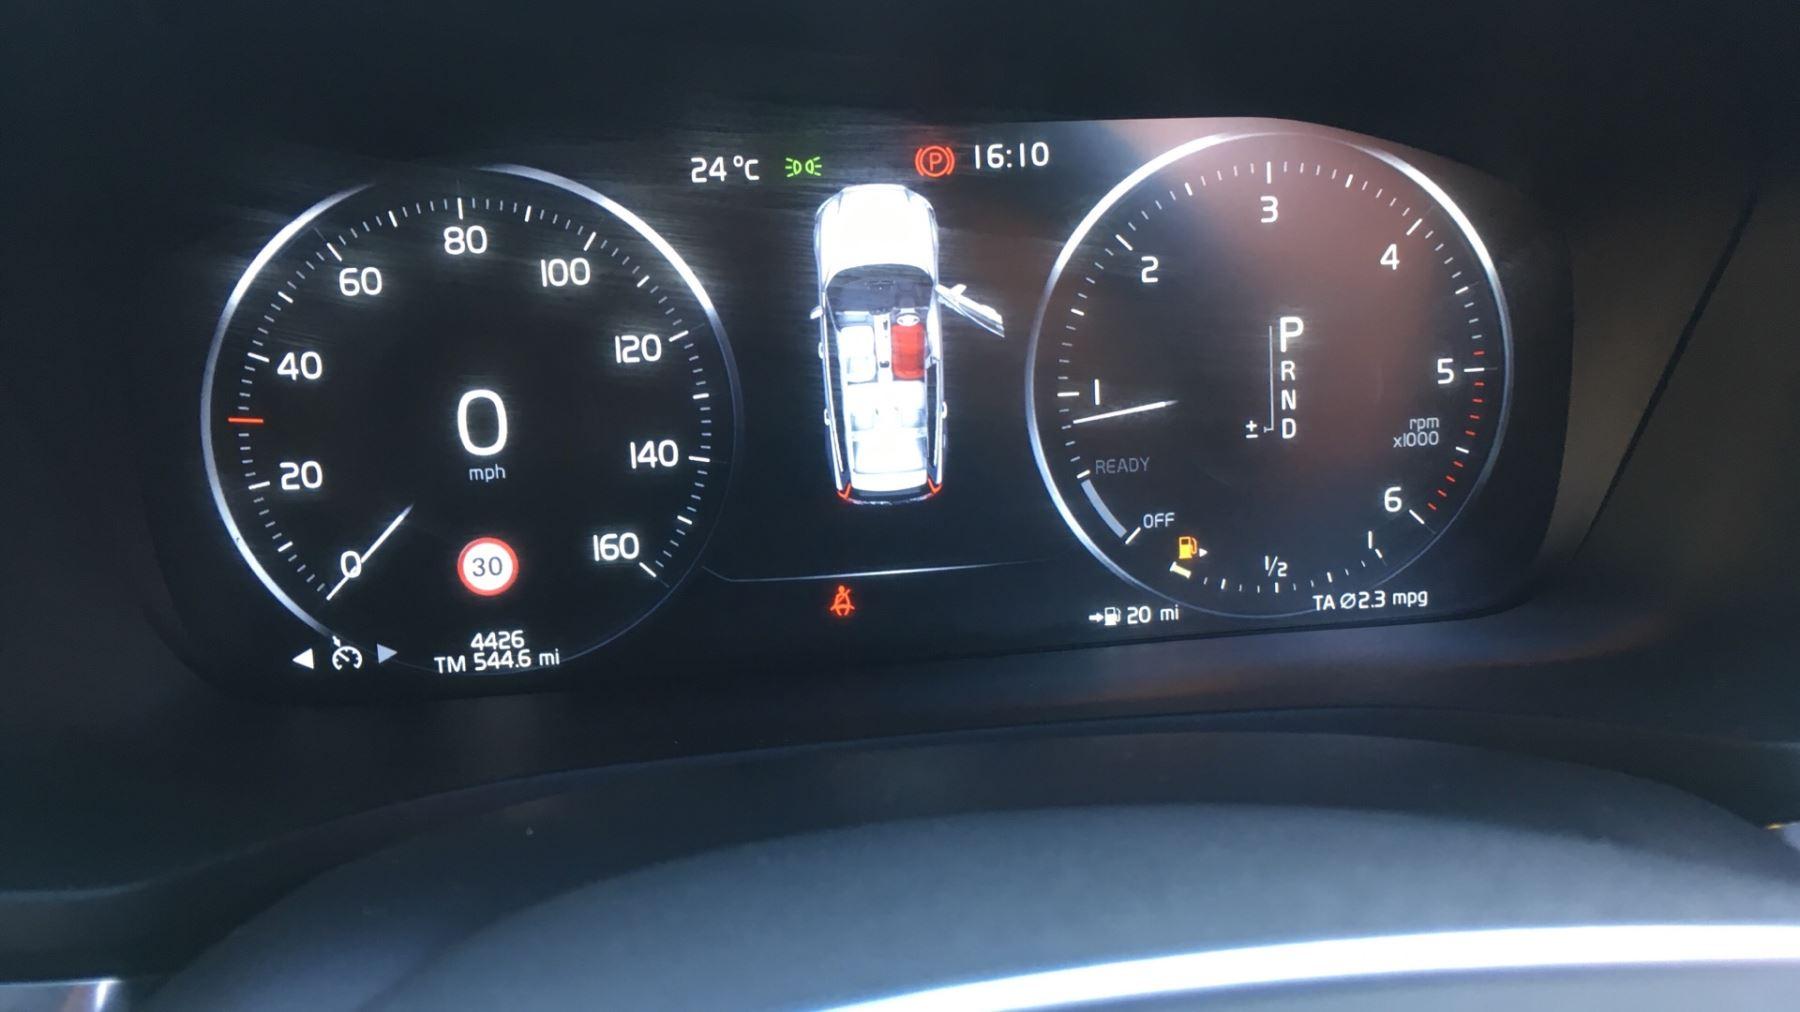 Volvo V60 2.0 D4 [190] R DESIGN 5dr - Volvo on Call, DAB Radio, SAT NAV, Park Assist image 7